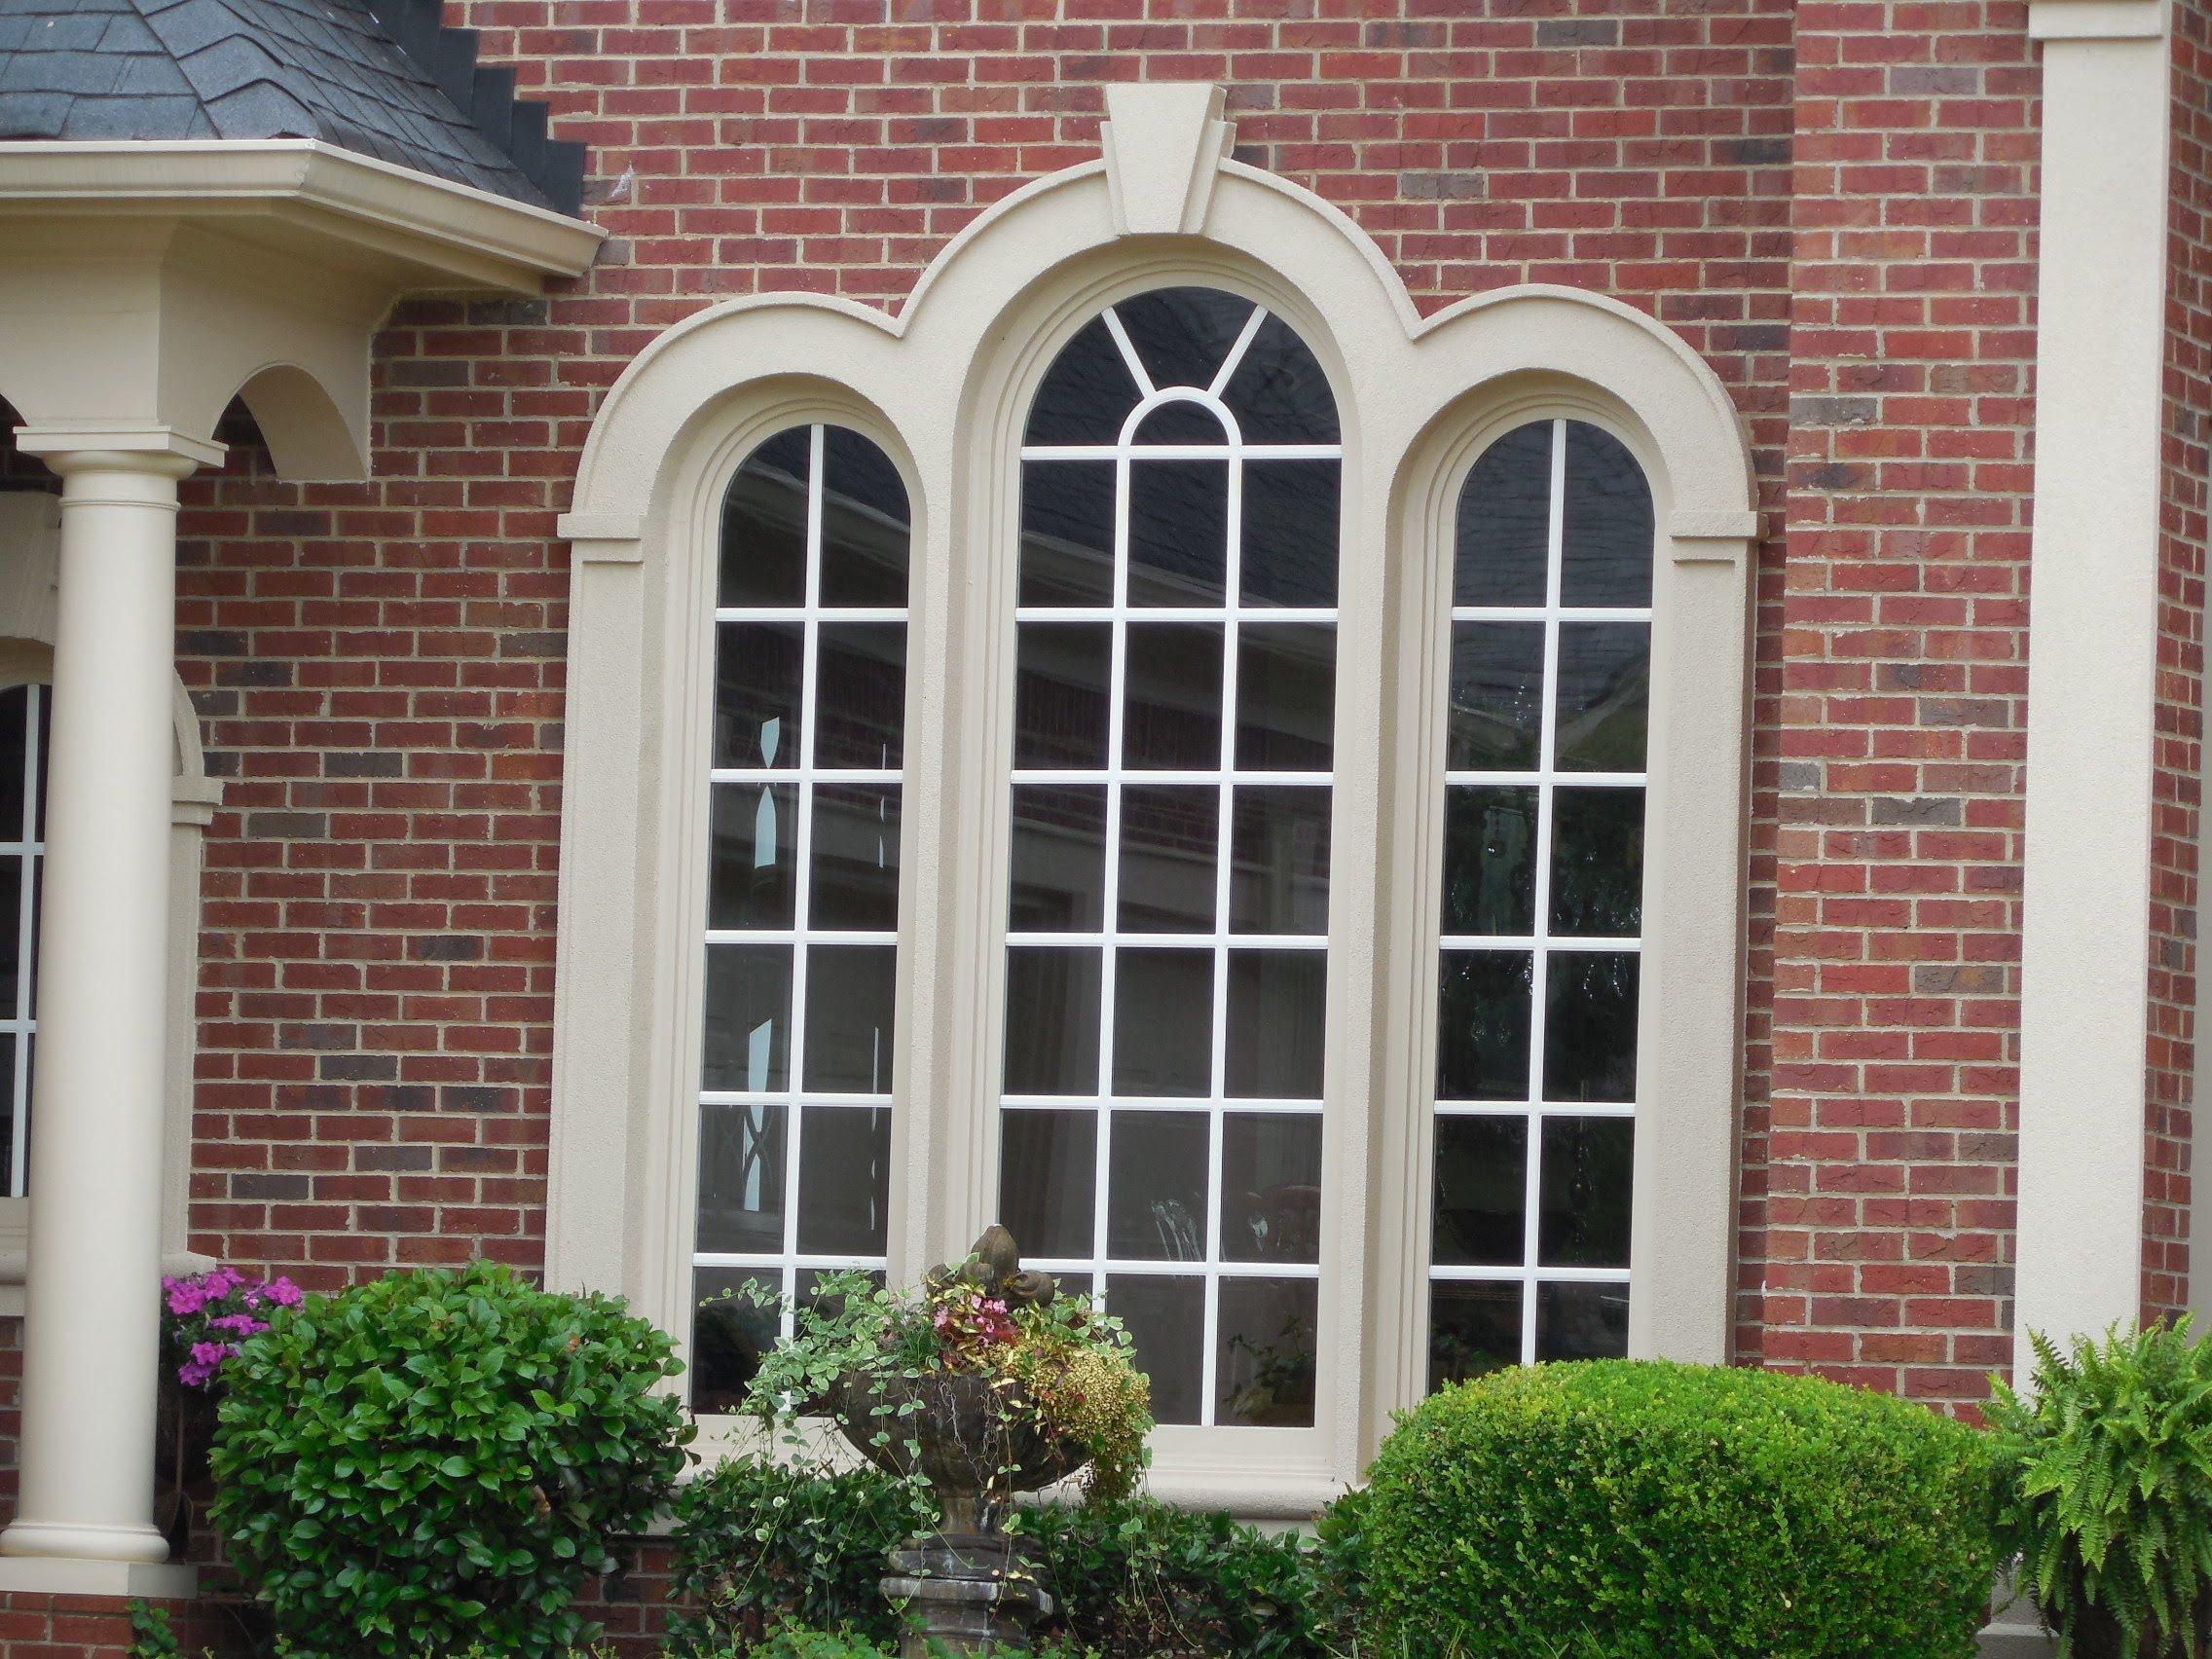 house window design your ideas of home window designs - home repair home improvements window SAPQHNL